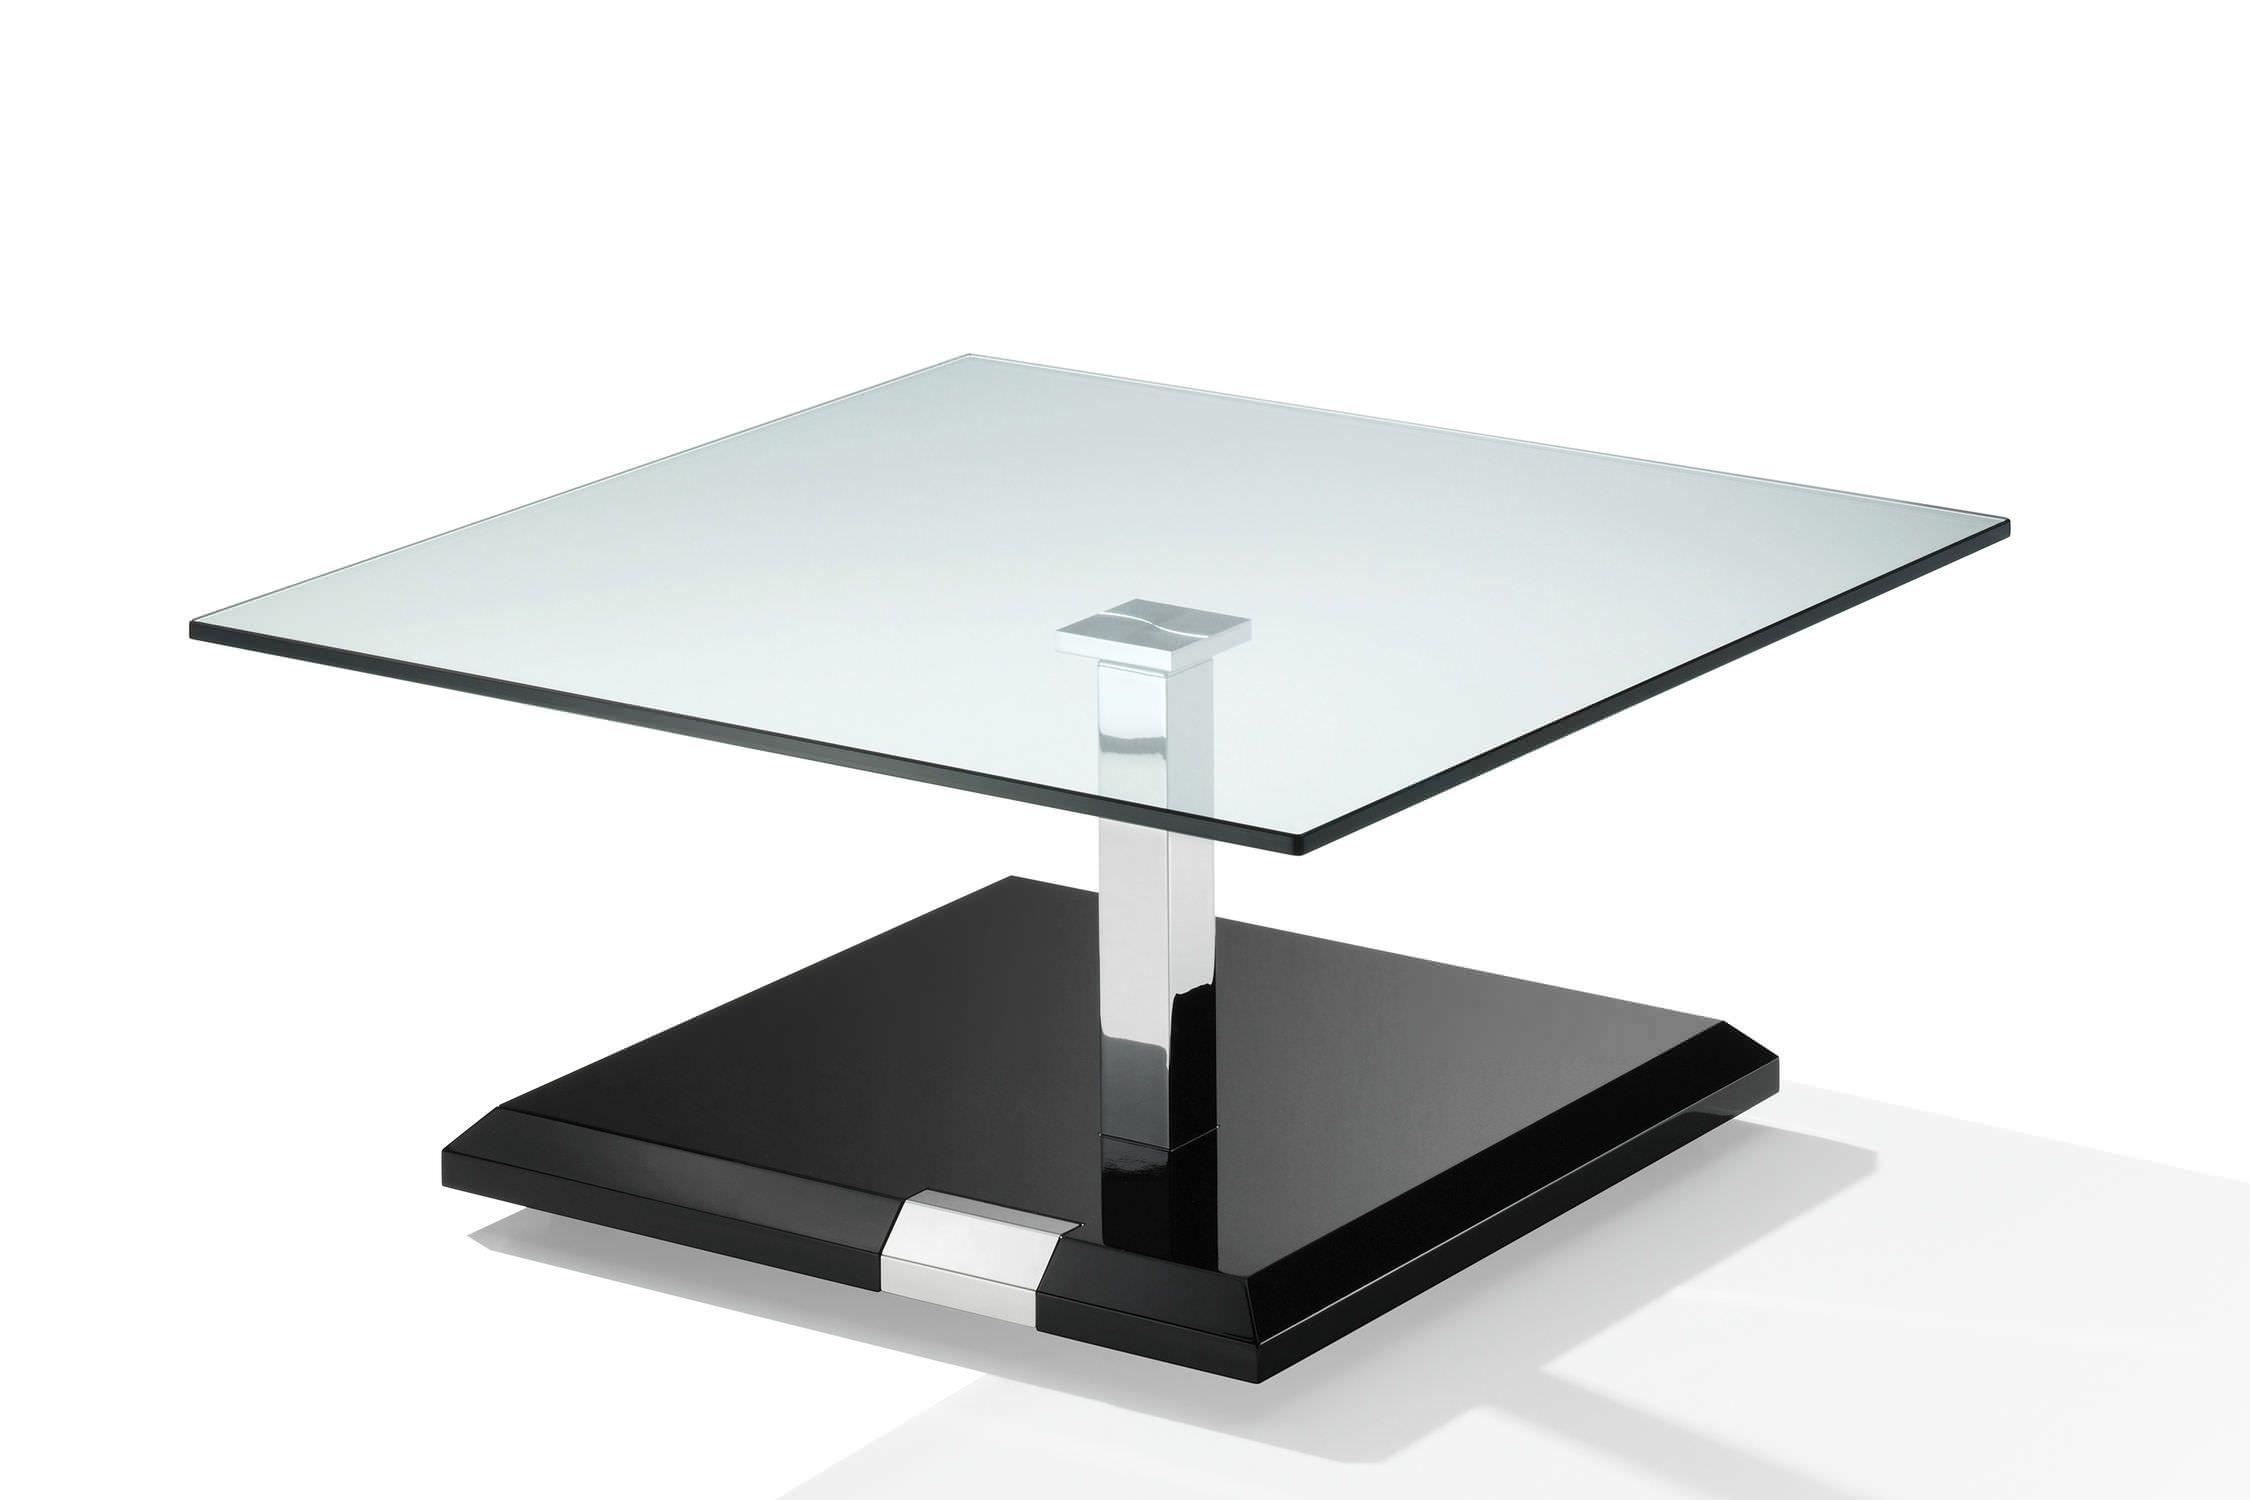 runder couchtisch glas trendy ubergrosser runder. Black Bedroom Furniture Sets. Home Design Ideas